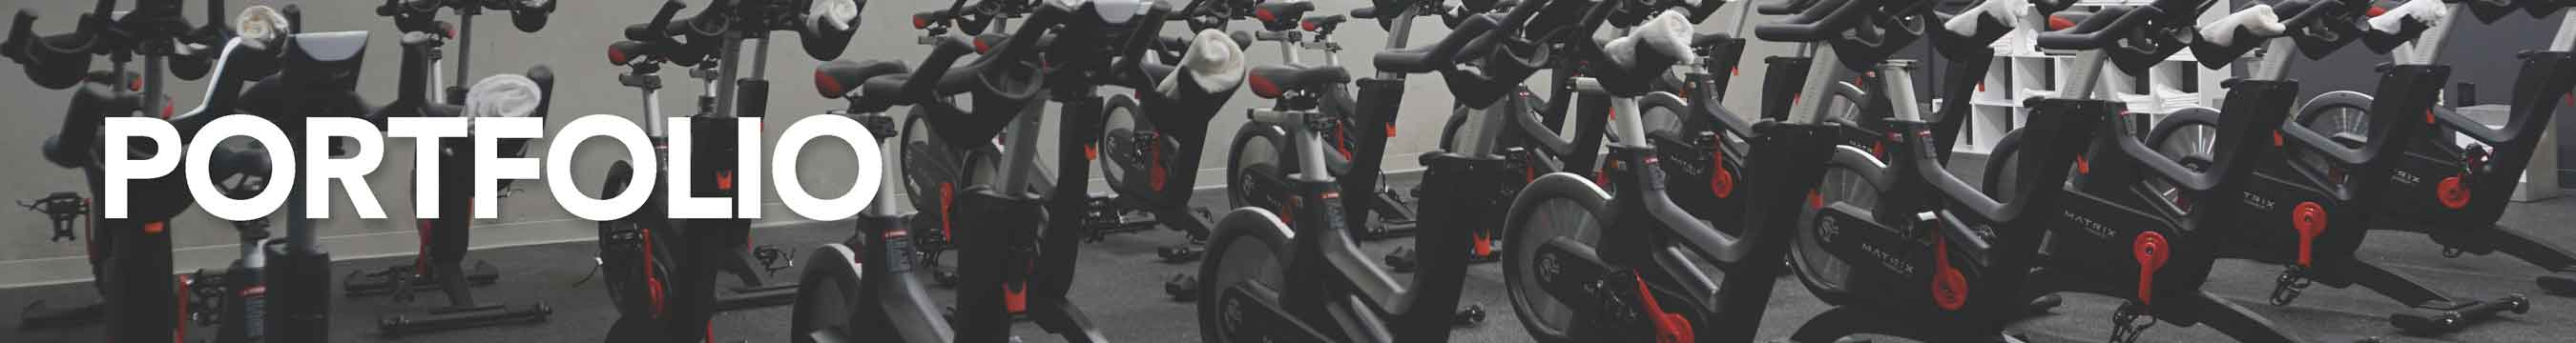 Active-Wellness-Portfolio.jpg